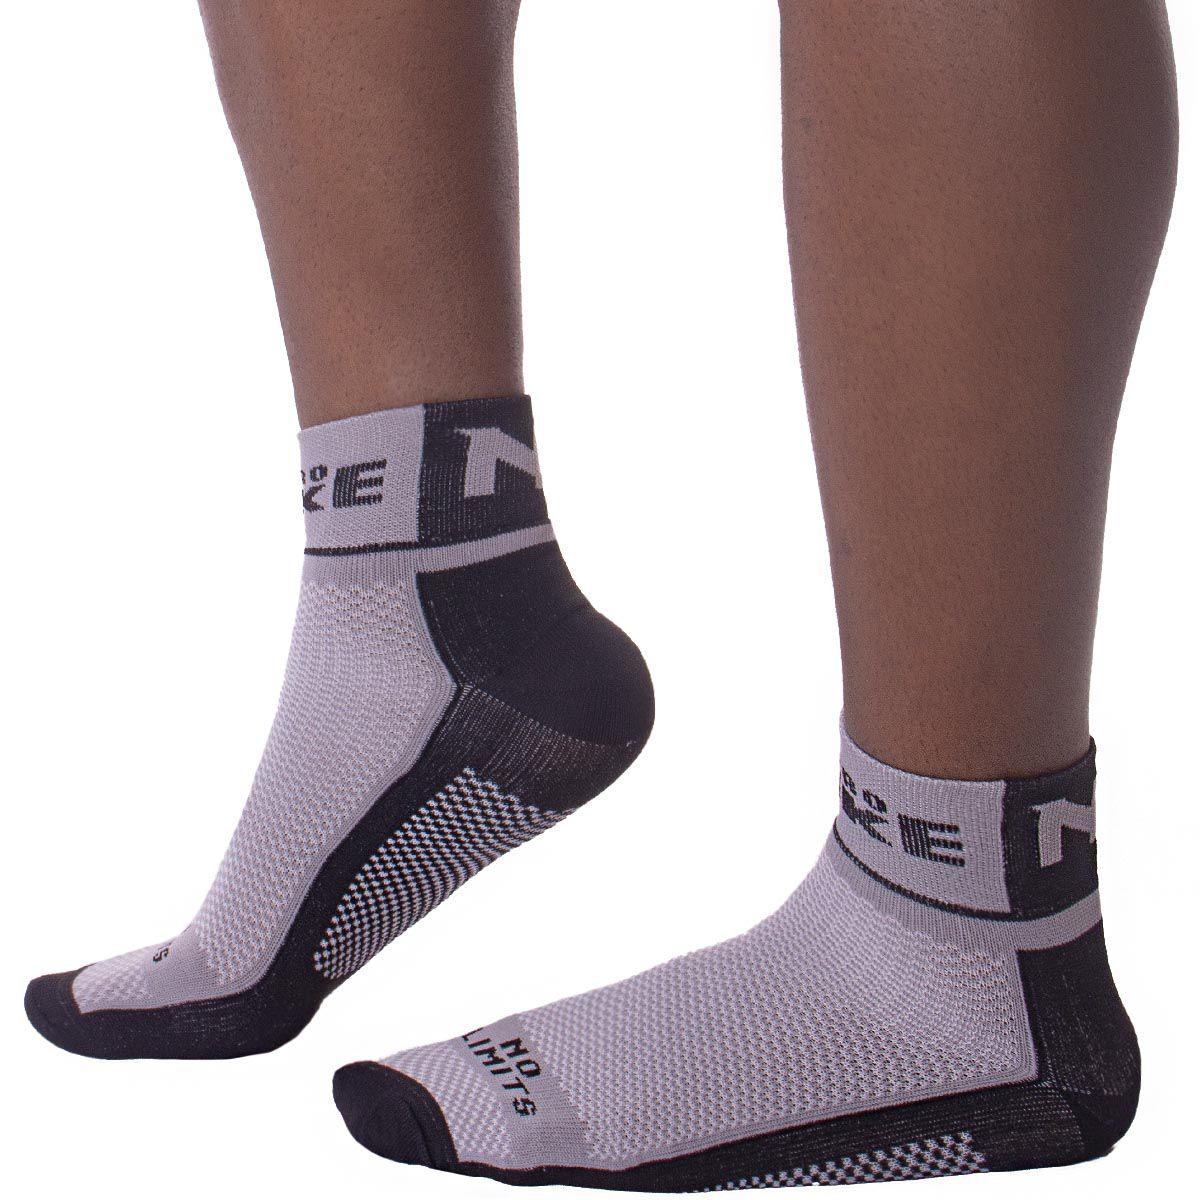 Meia para ciclista masculina cano curto em microfibra Apollo